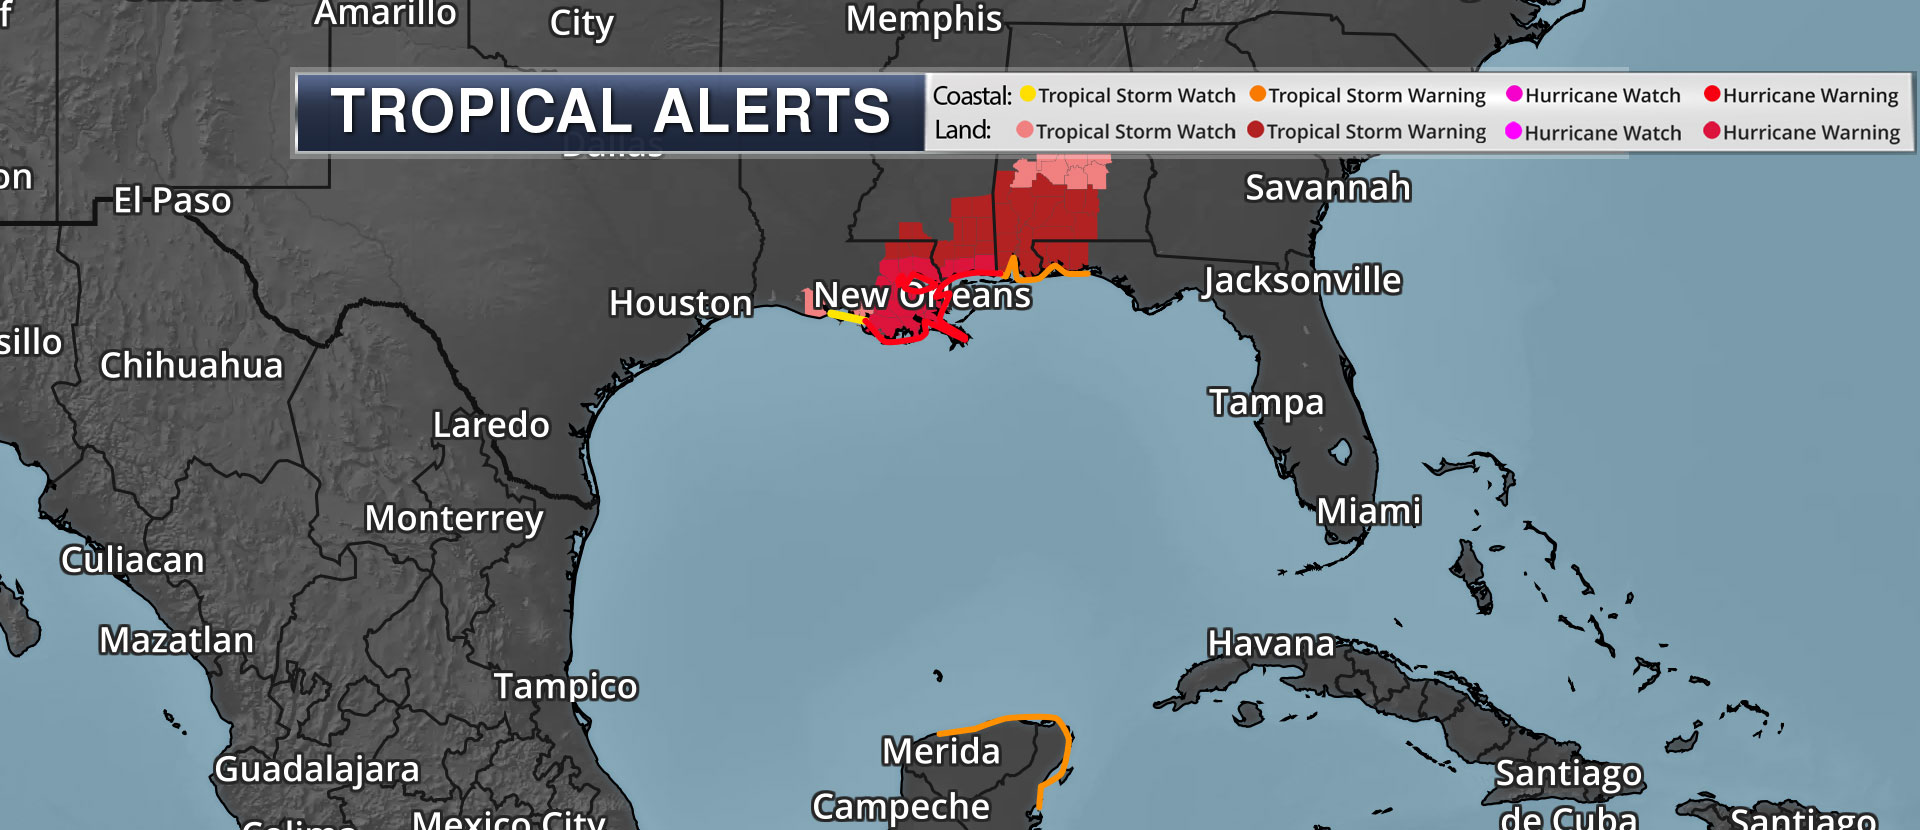 tropical-alerts-10-radar10.28